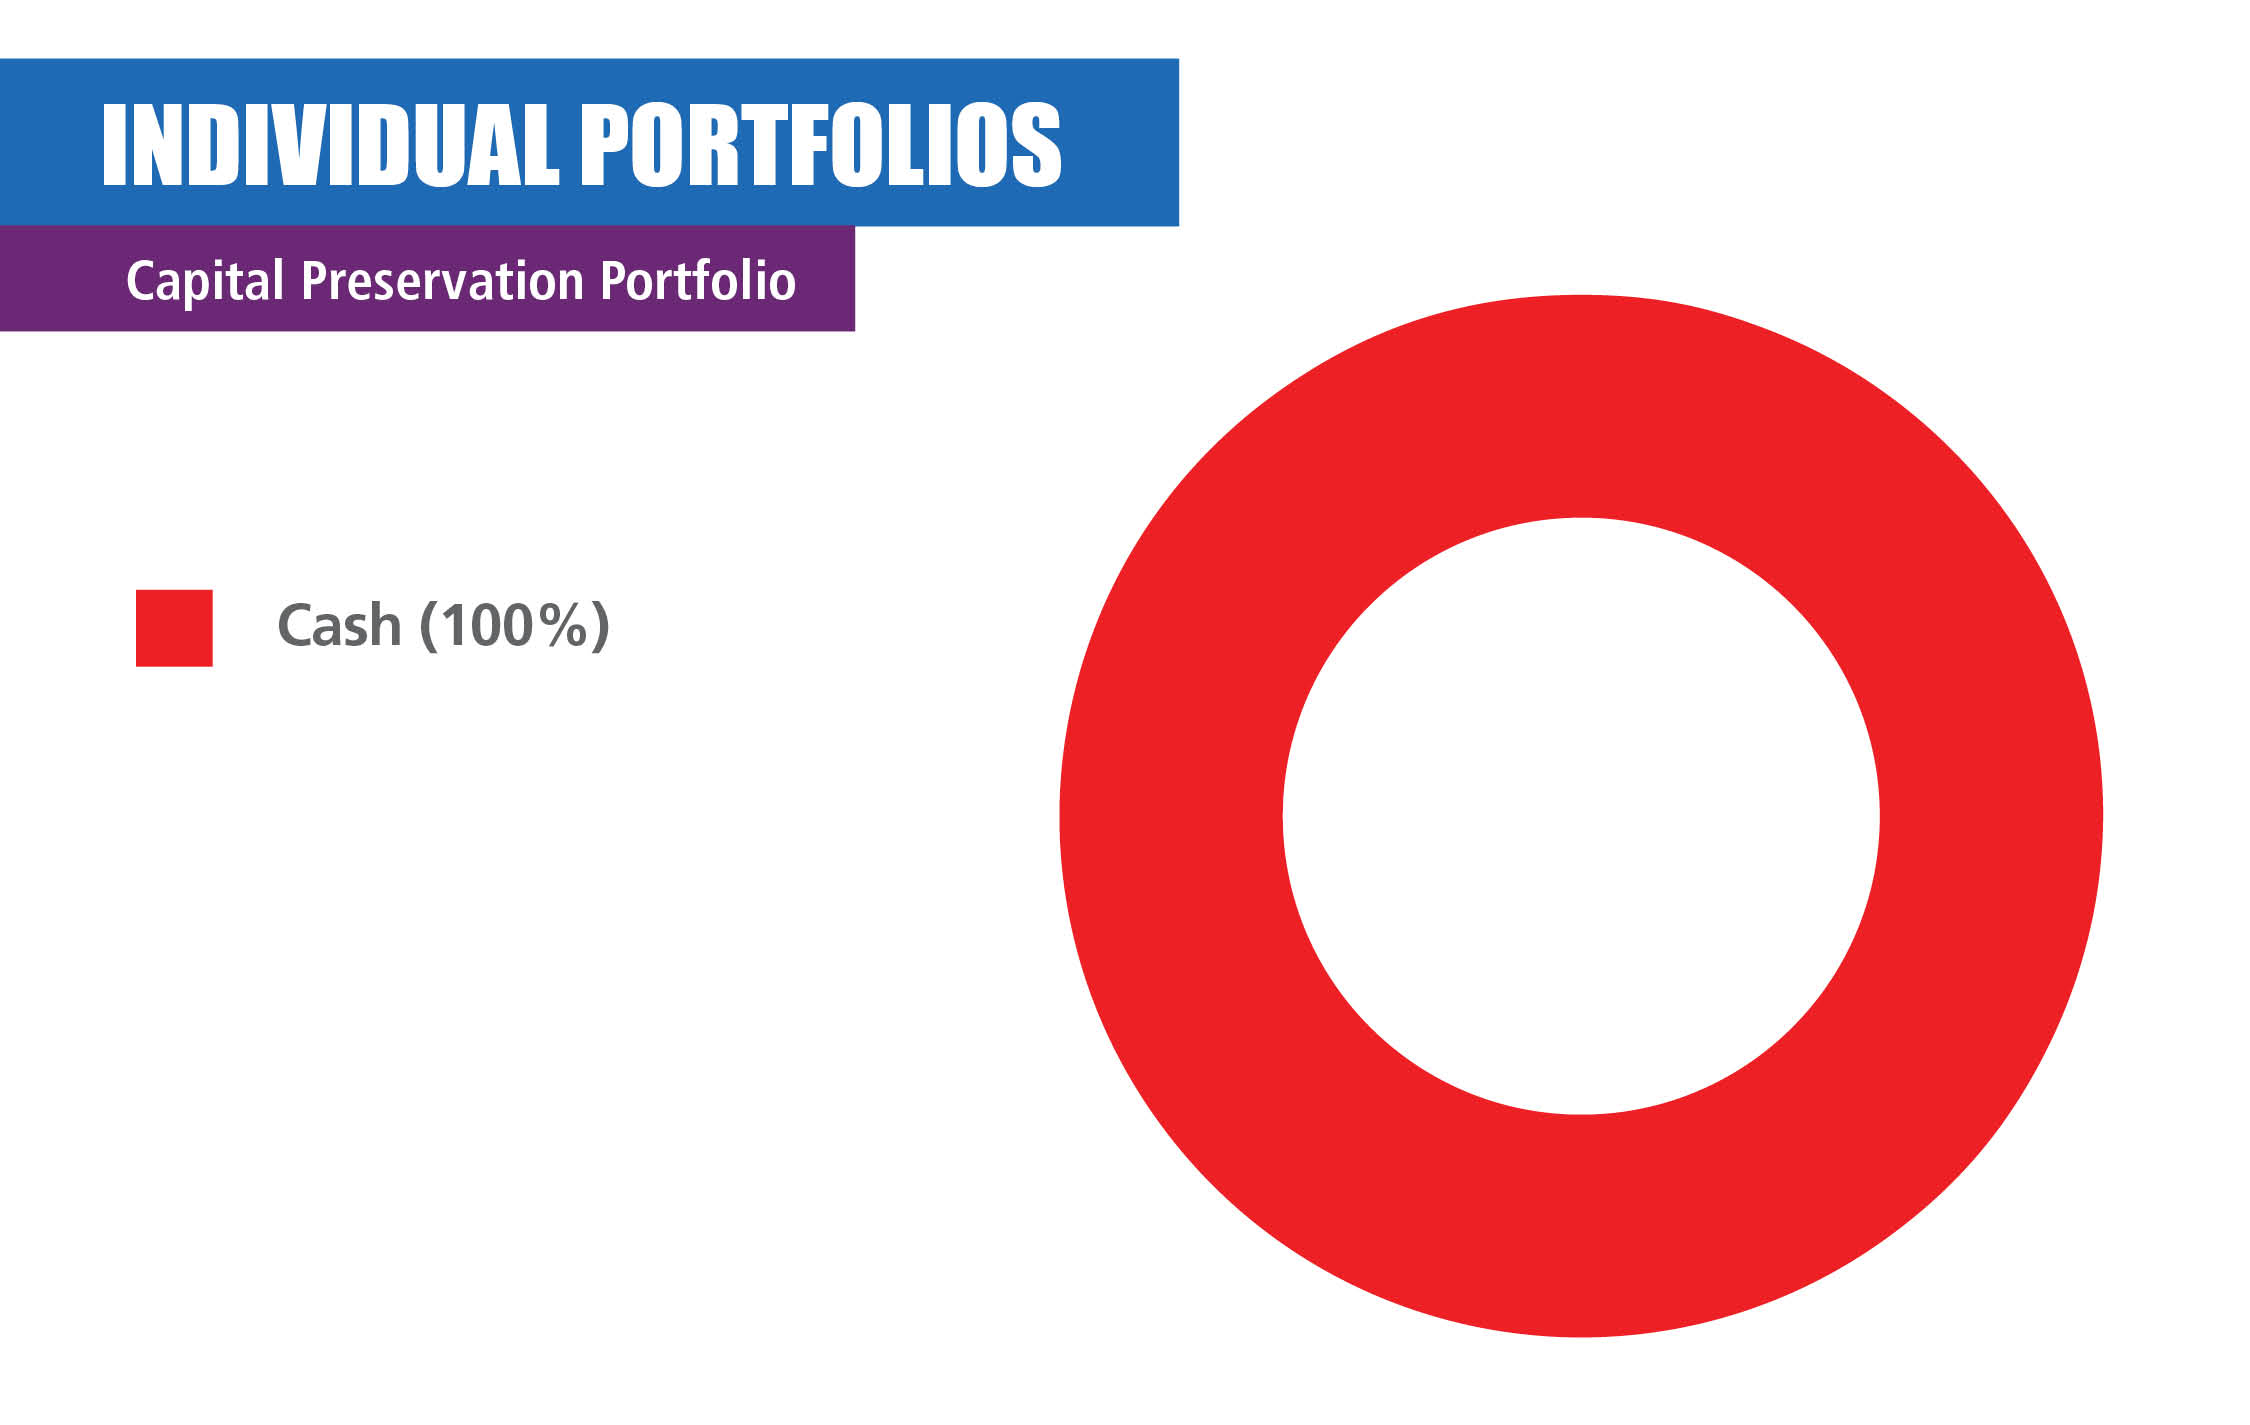 Capital Preservation Portfolio